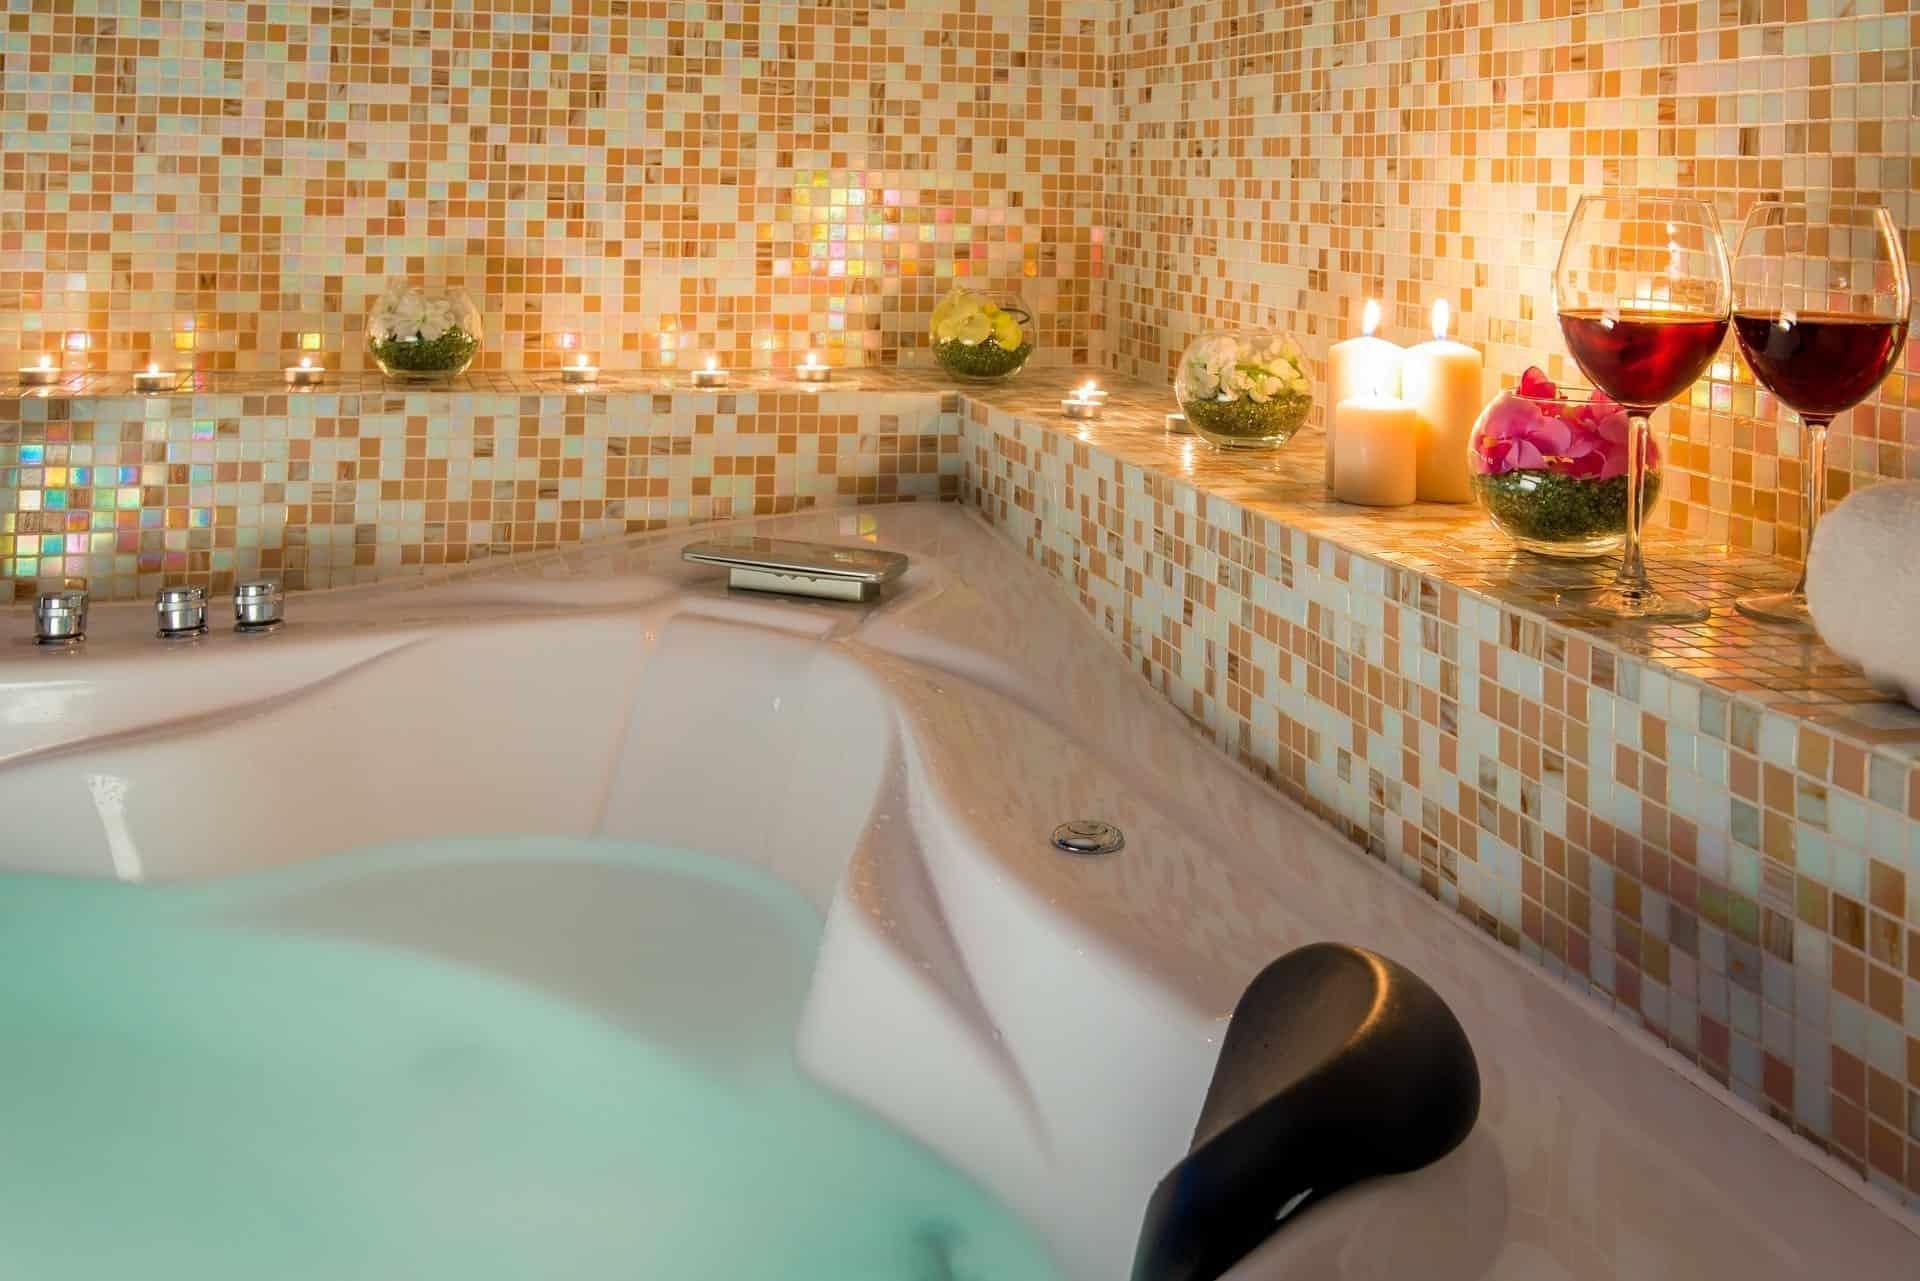 evening romantic bath for loving couples